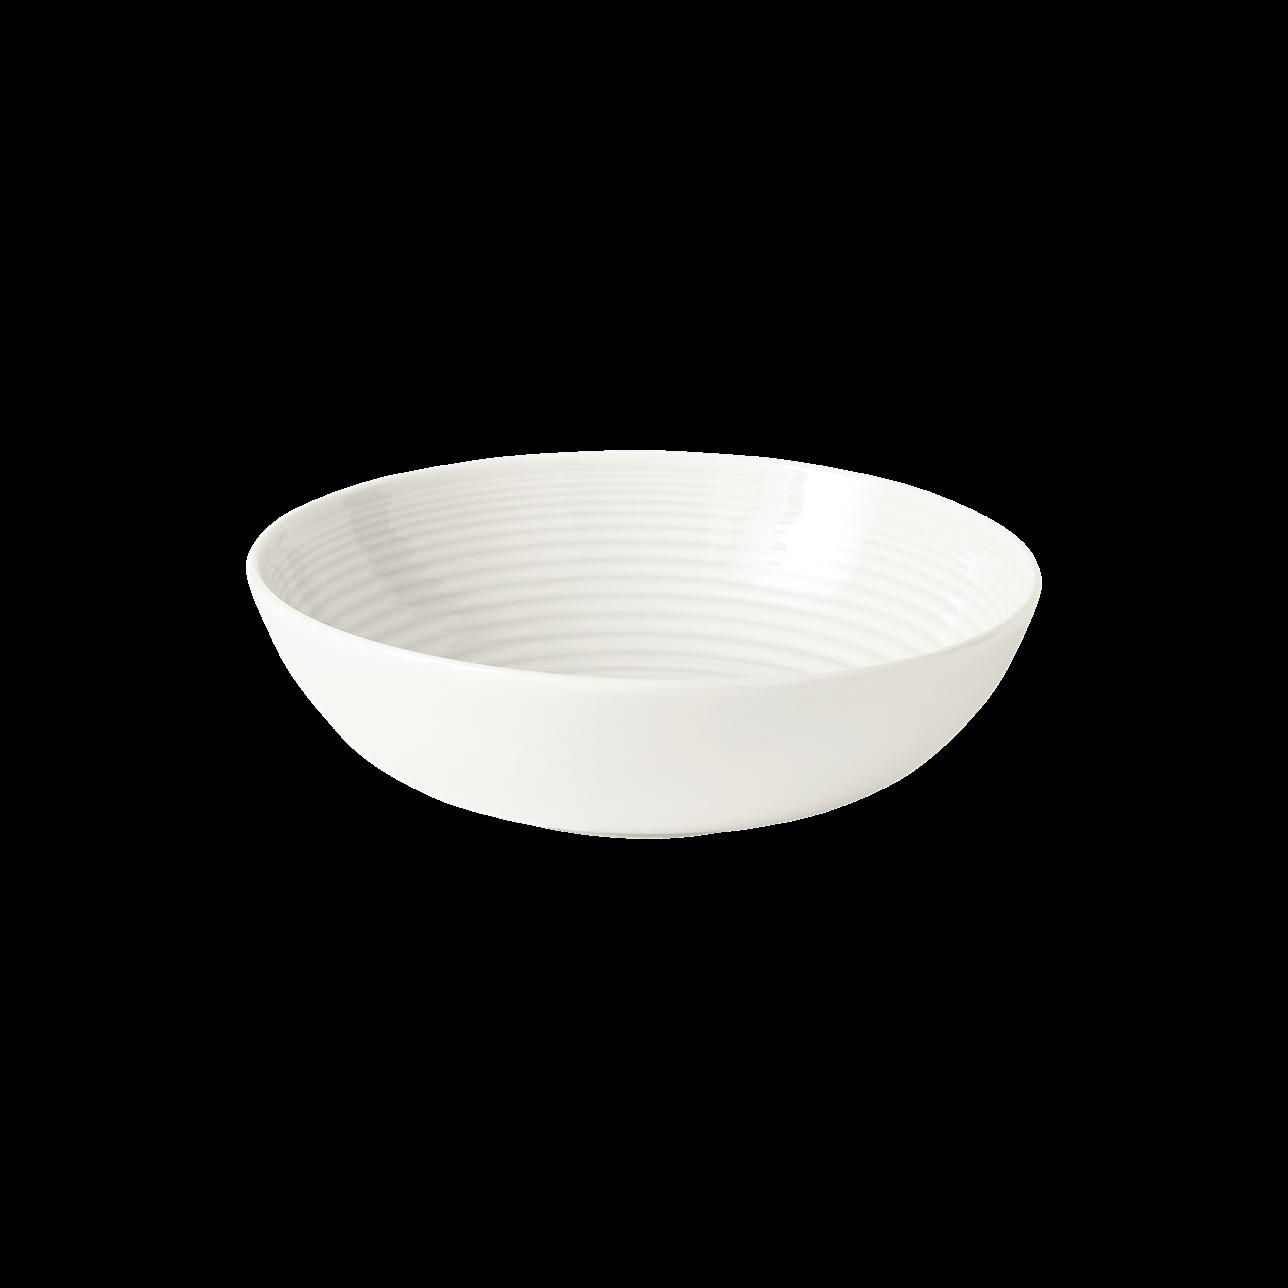 Maze White Cereal Bowl